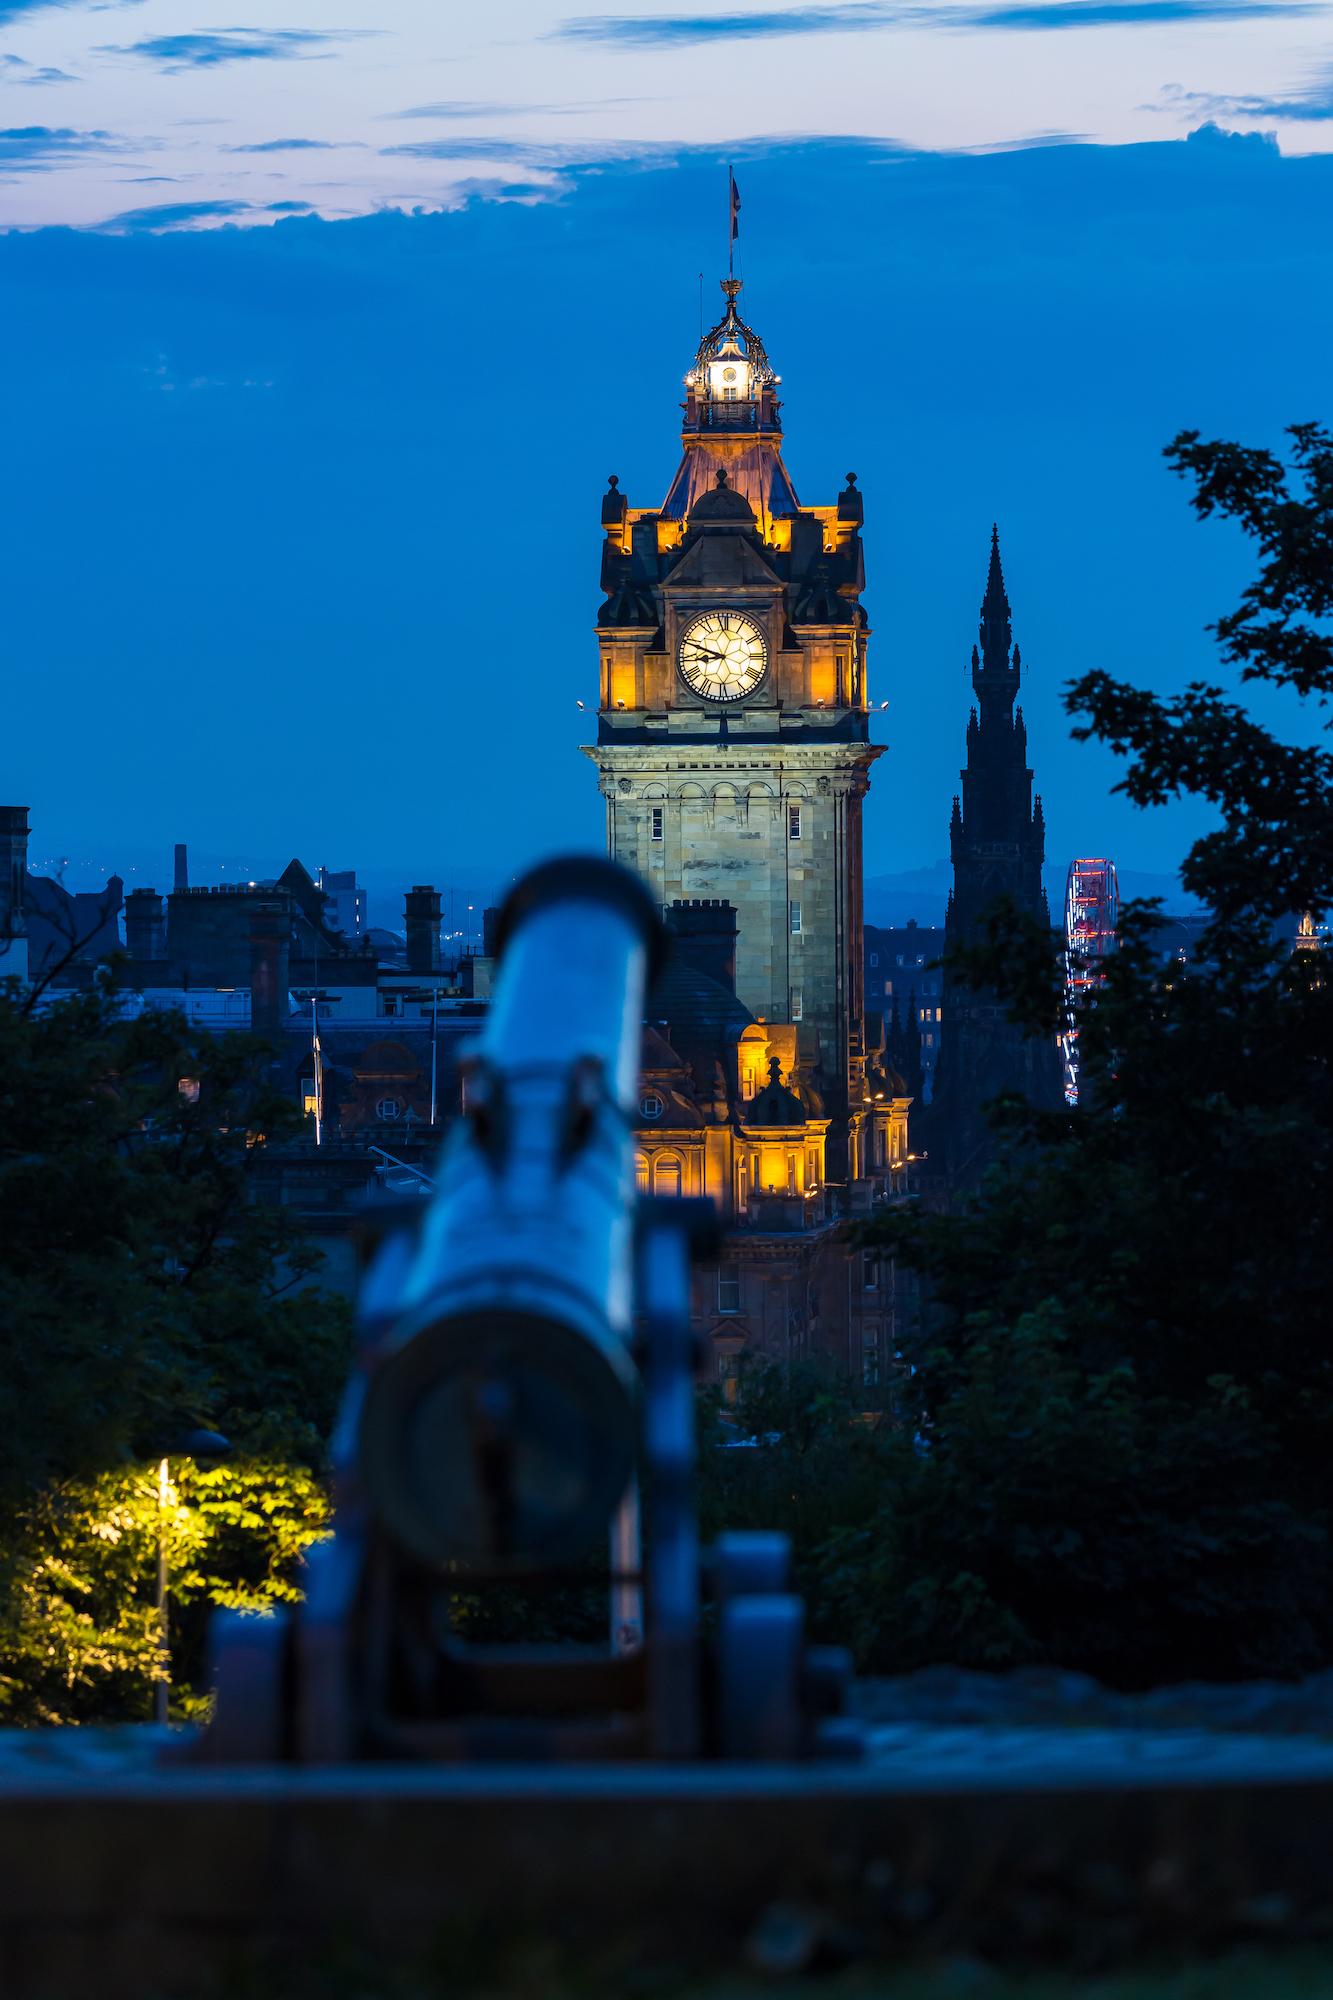 (473) The Portugese Cannon, The Balmoral Hotel and Scott Monument, Calton Hill, Edinburgh, Scotland.jpg